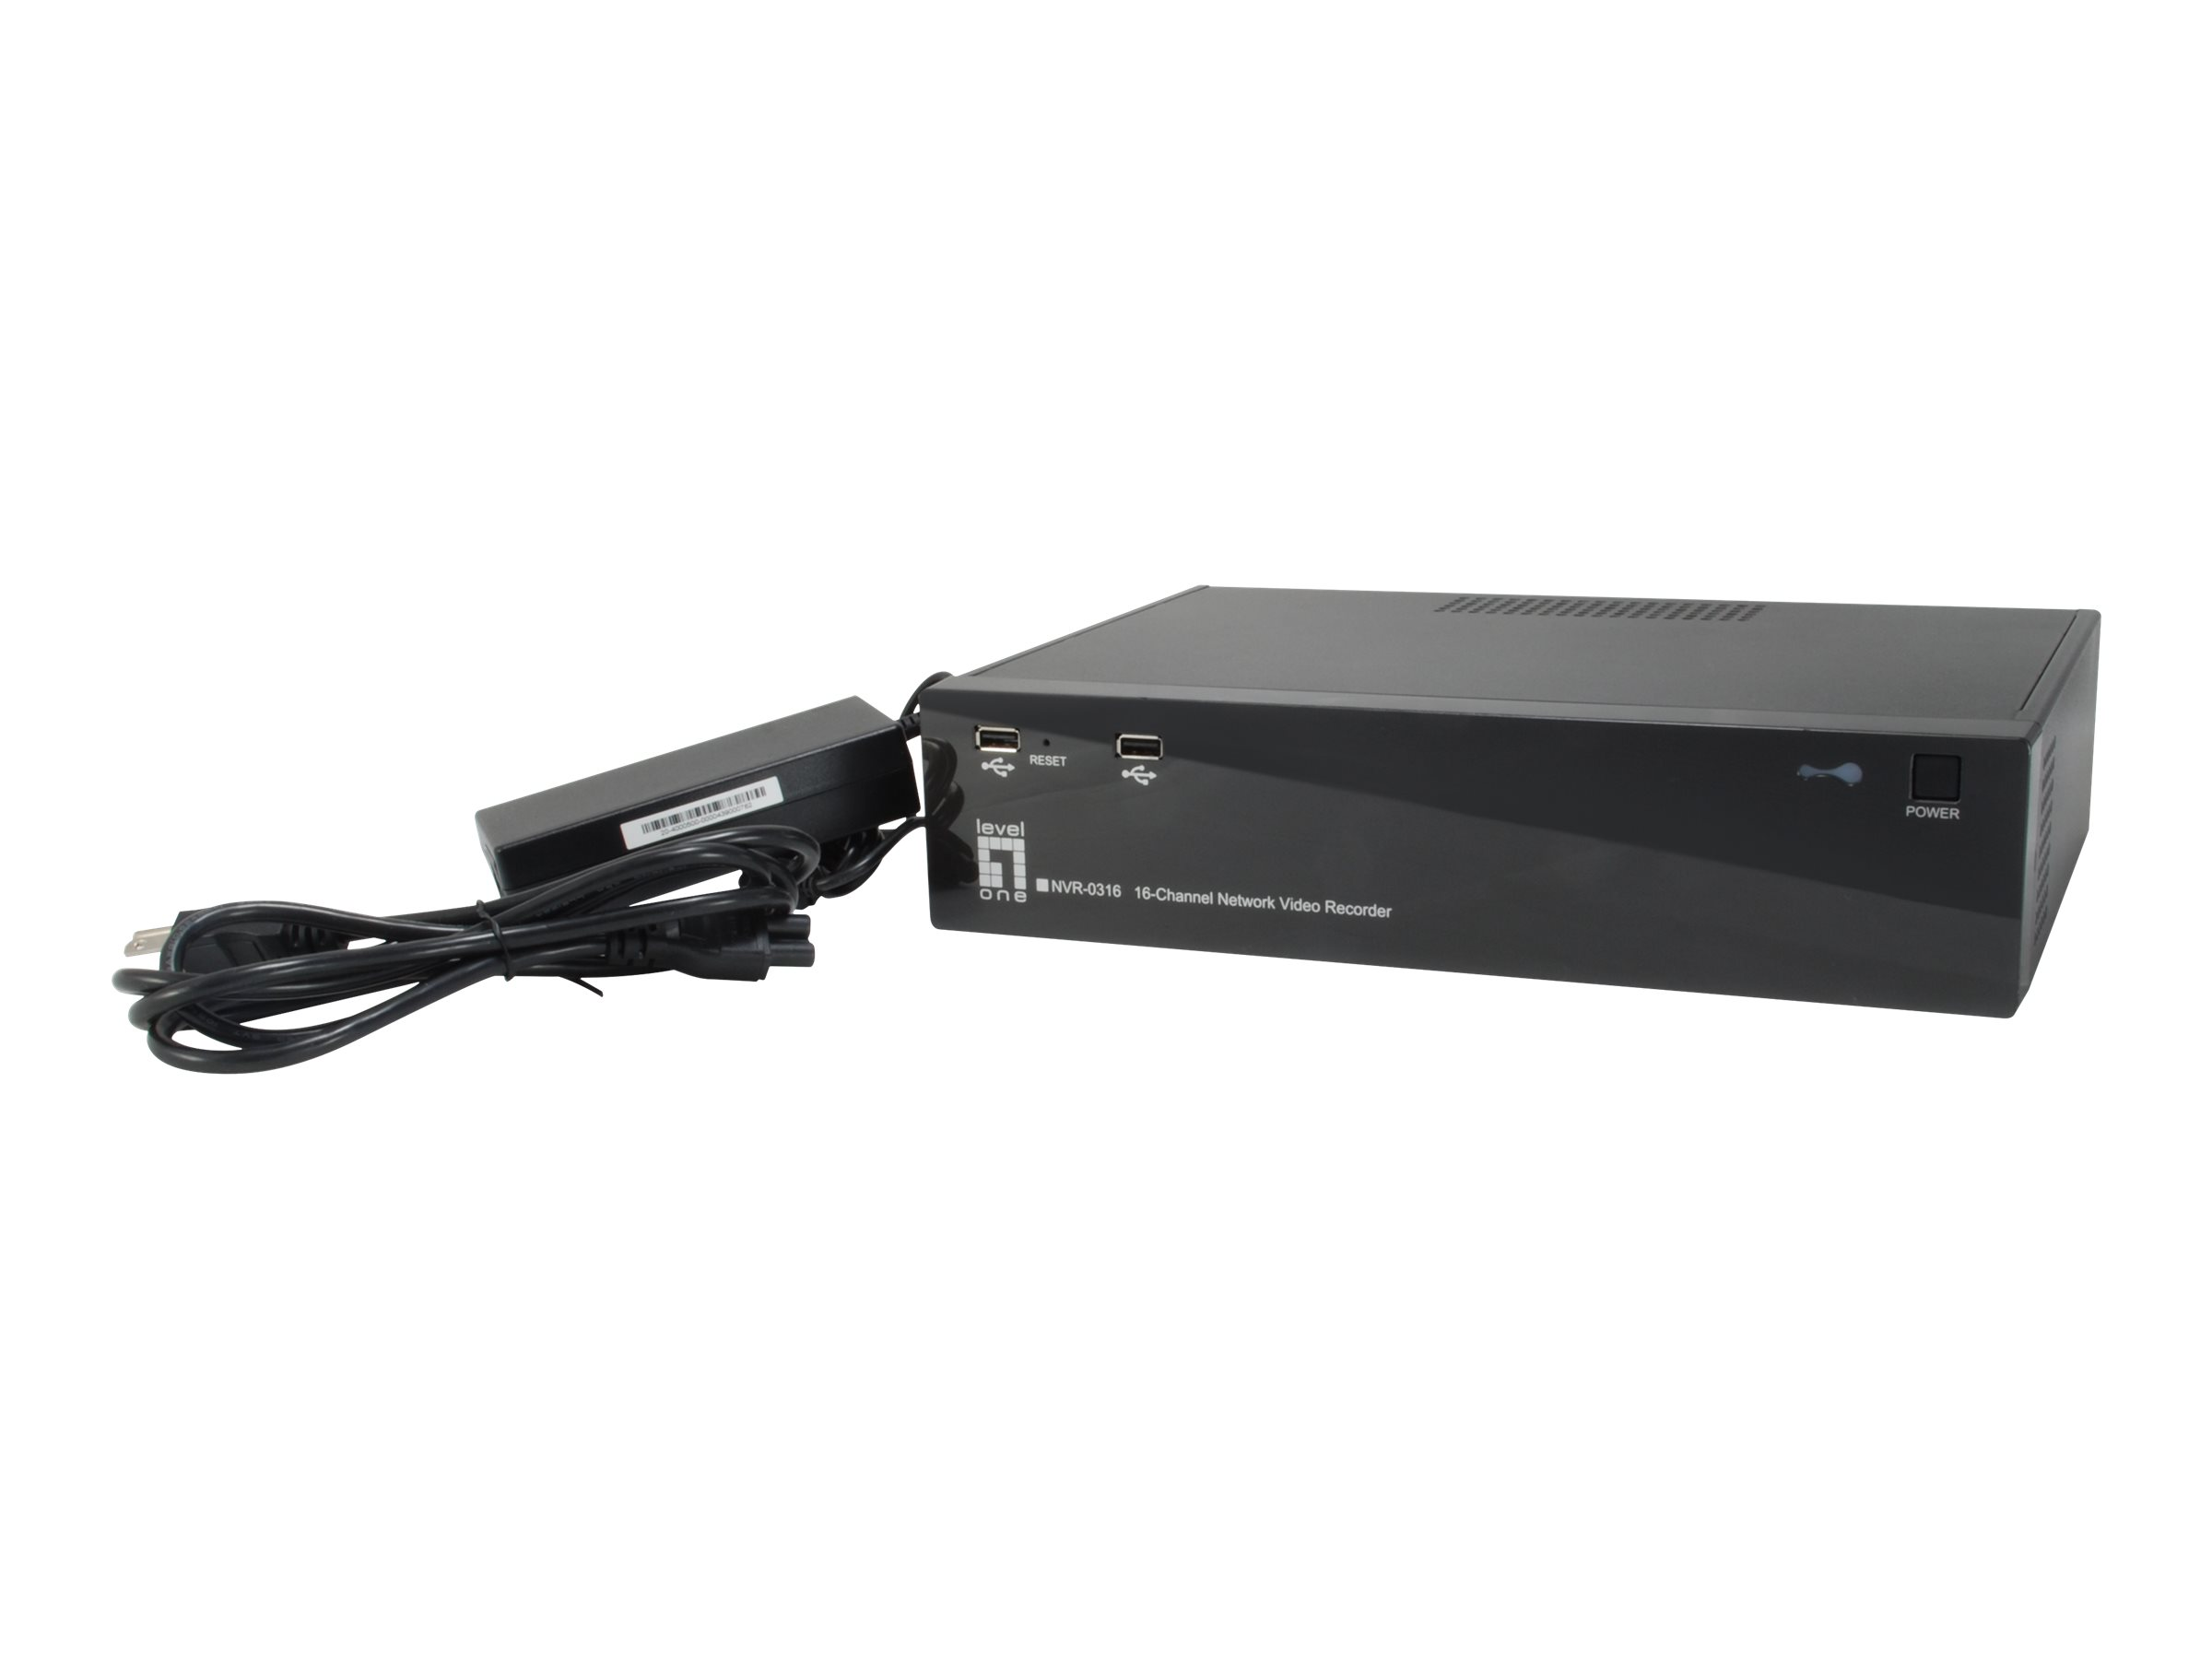 LevelOne NVR-0316 - NVR - 16 Kanäle - netzwerkfähig